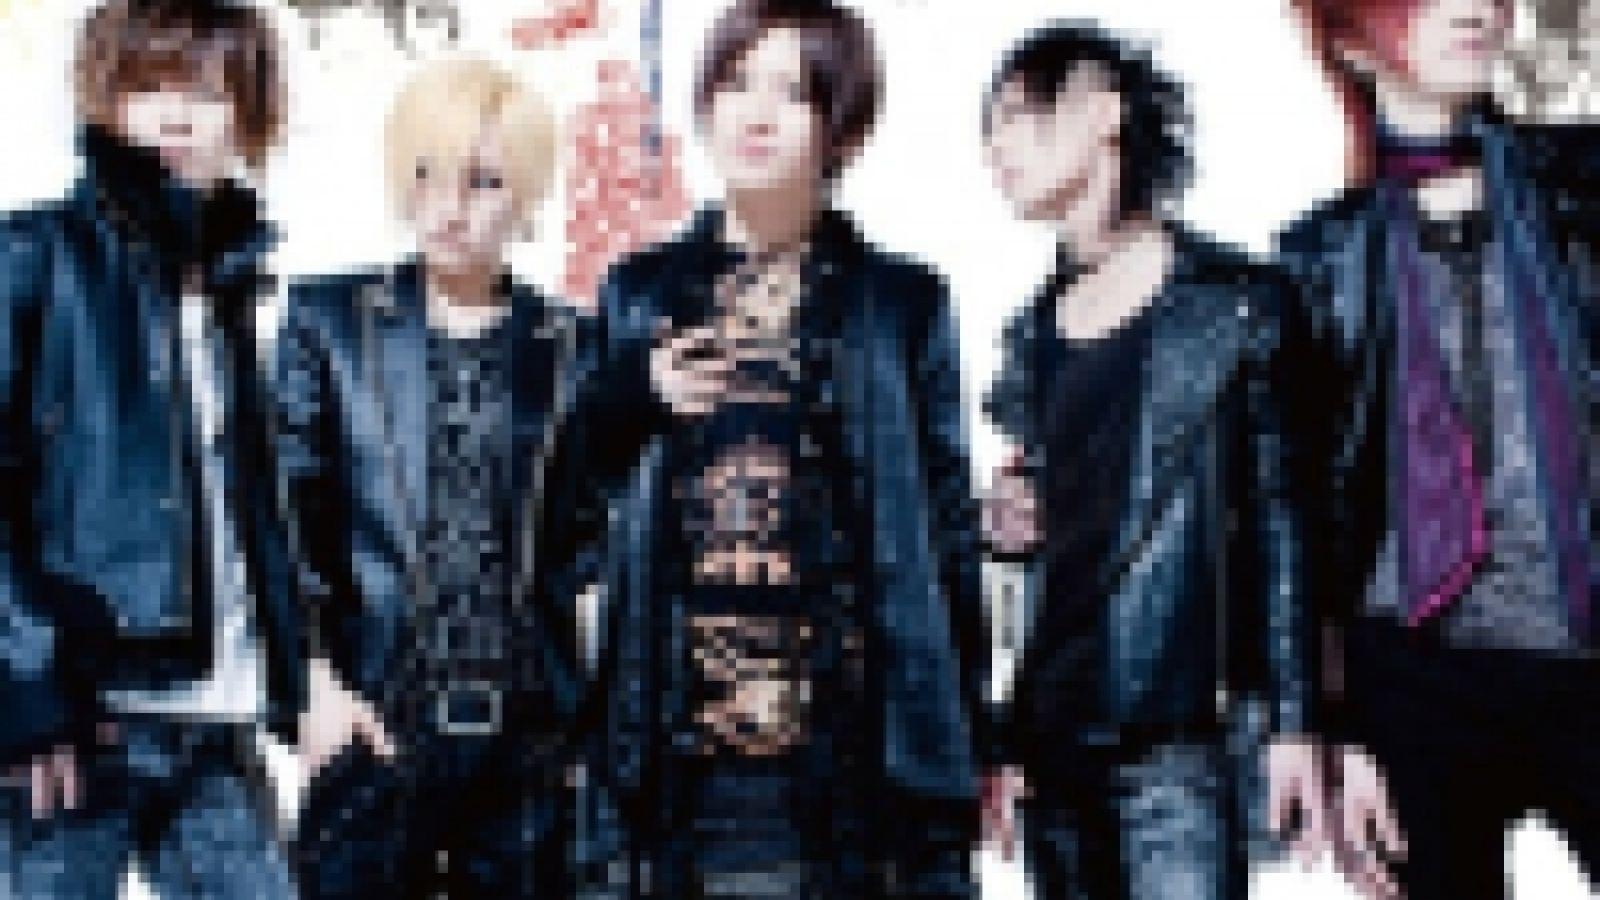 Lc5 sort son troisième single © Sony Music Entertainment (Japan) Inc.